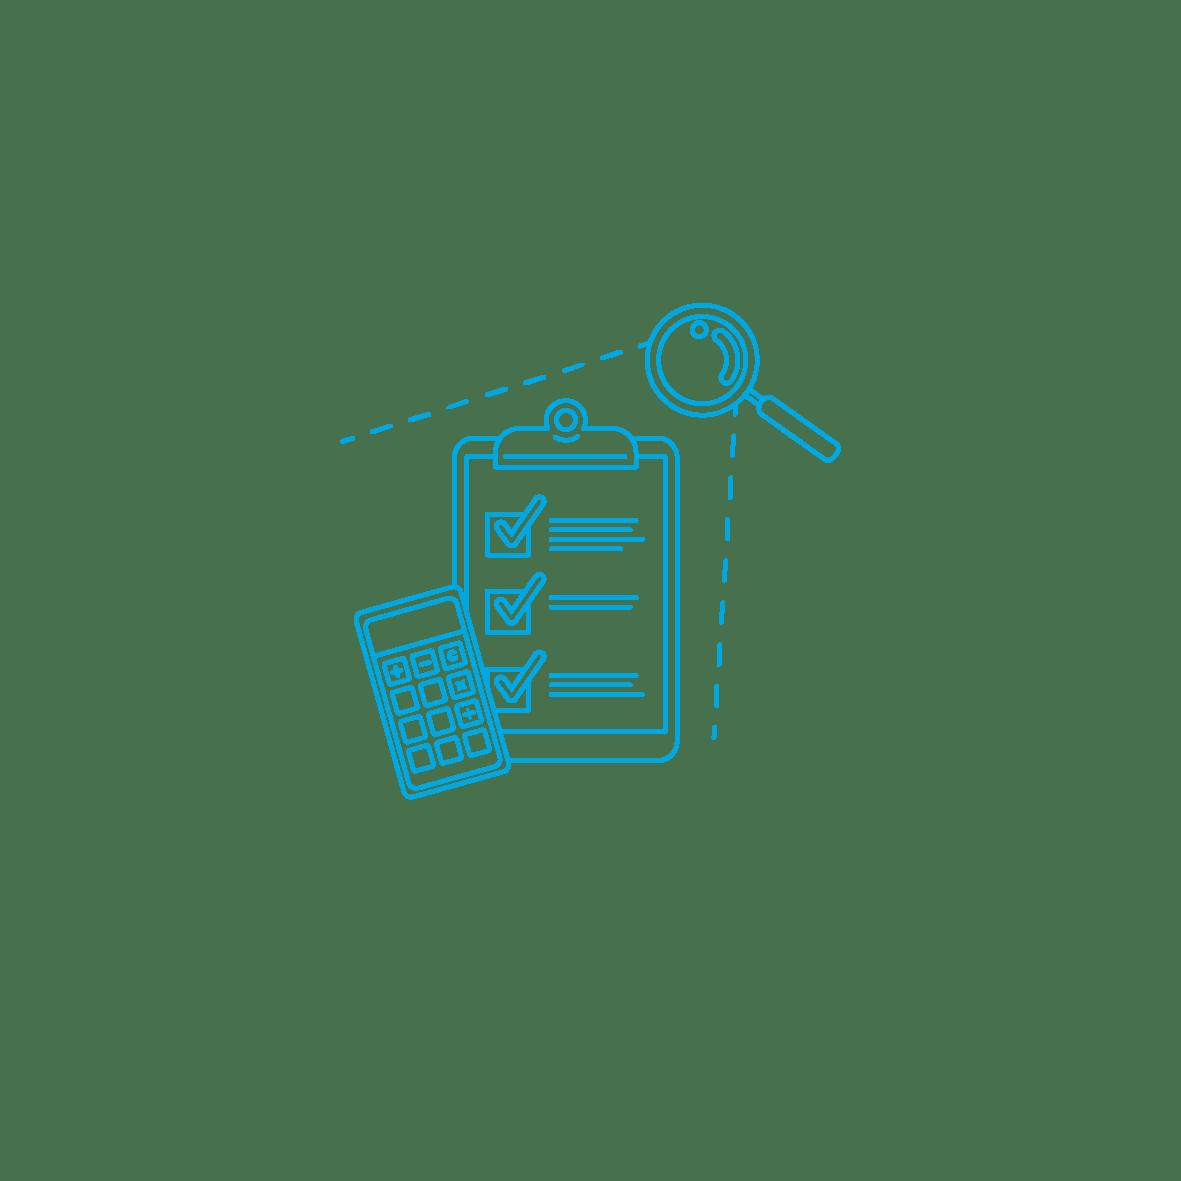 basic_illustrations-05-audit_assurance_checklist_inspection_review.png